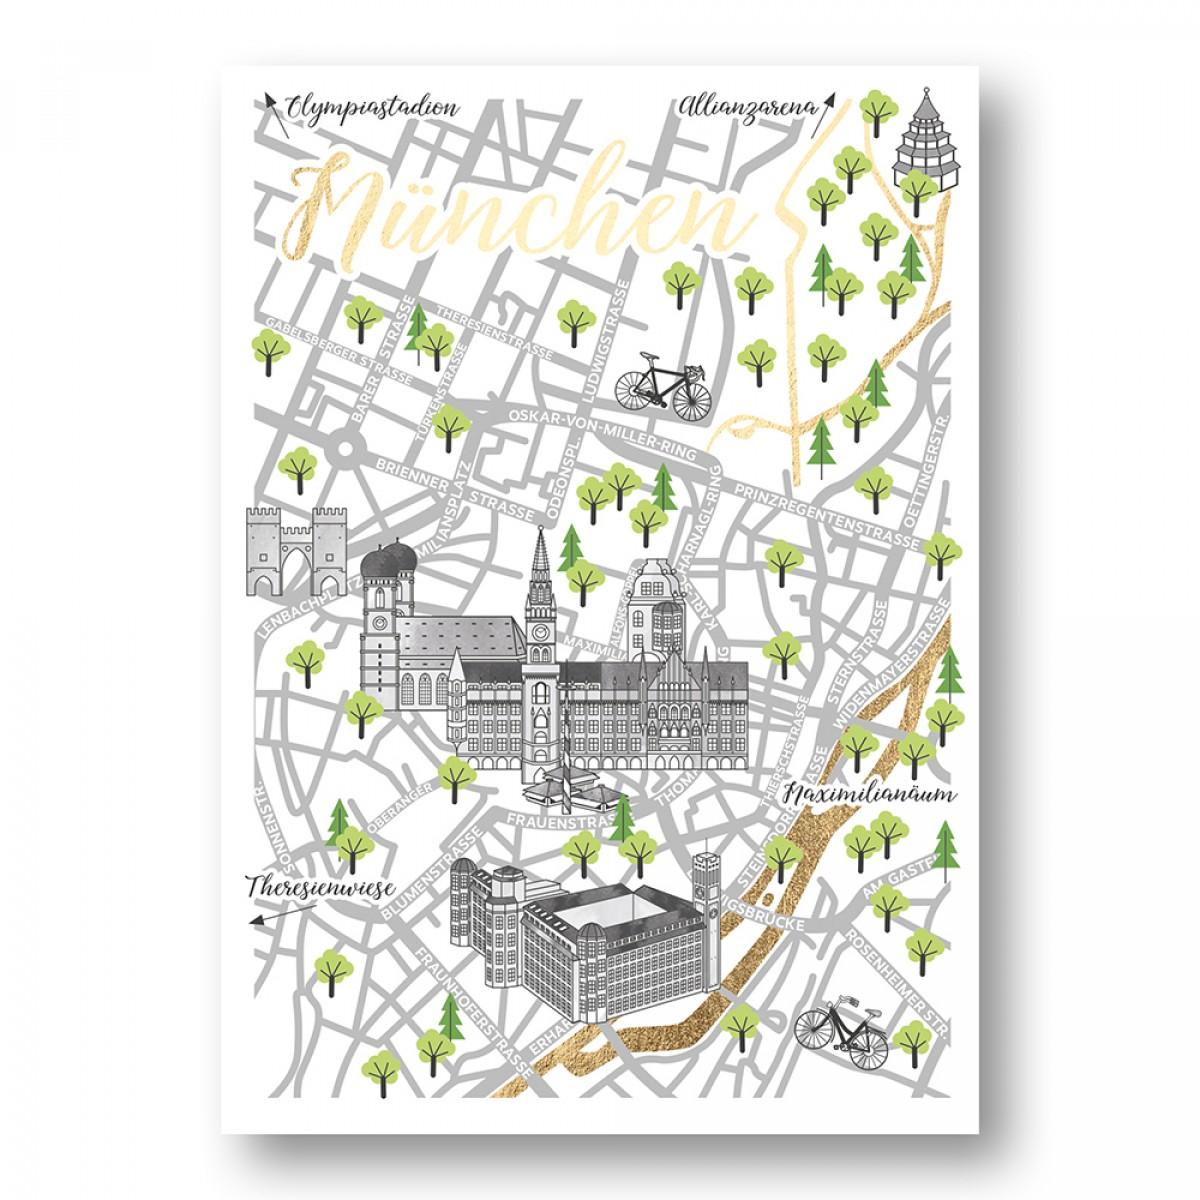 mo.konzept | Stadtkarte Straßenkarte Postkarte München mit Goldfolie | 4er-Set